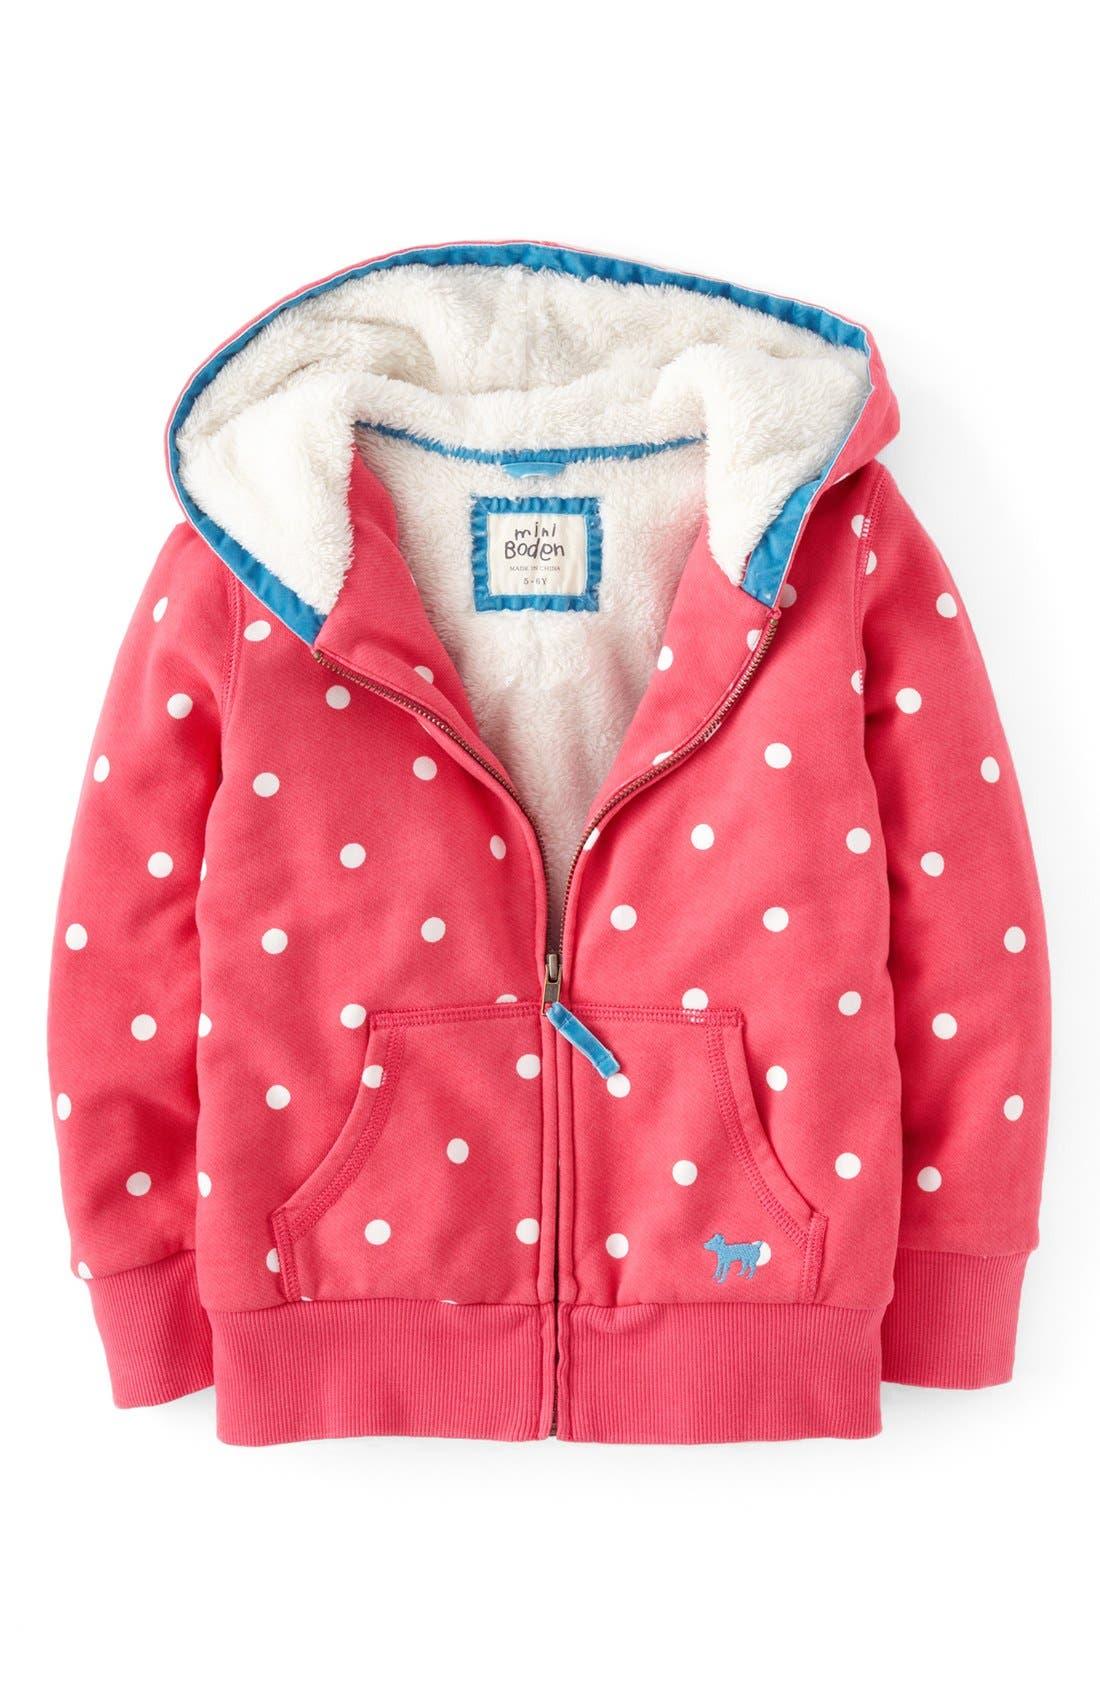 Alternate Image 1 Selected - Mini Boden 'Shaggy' Lined Jacket (Toddler Girls, Little Girls & Big Girls)